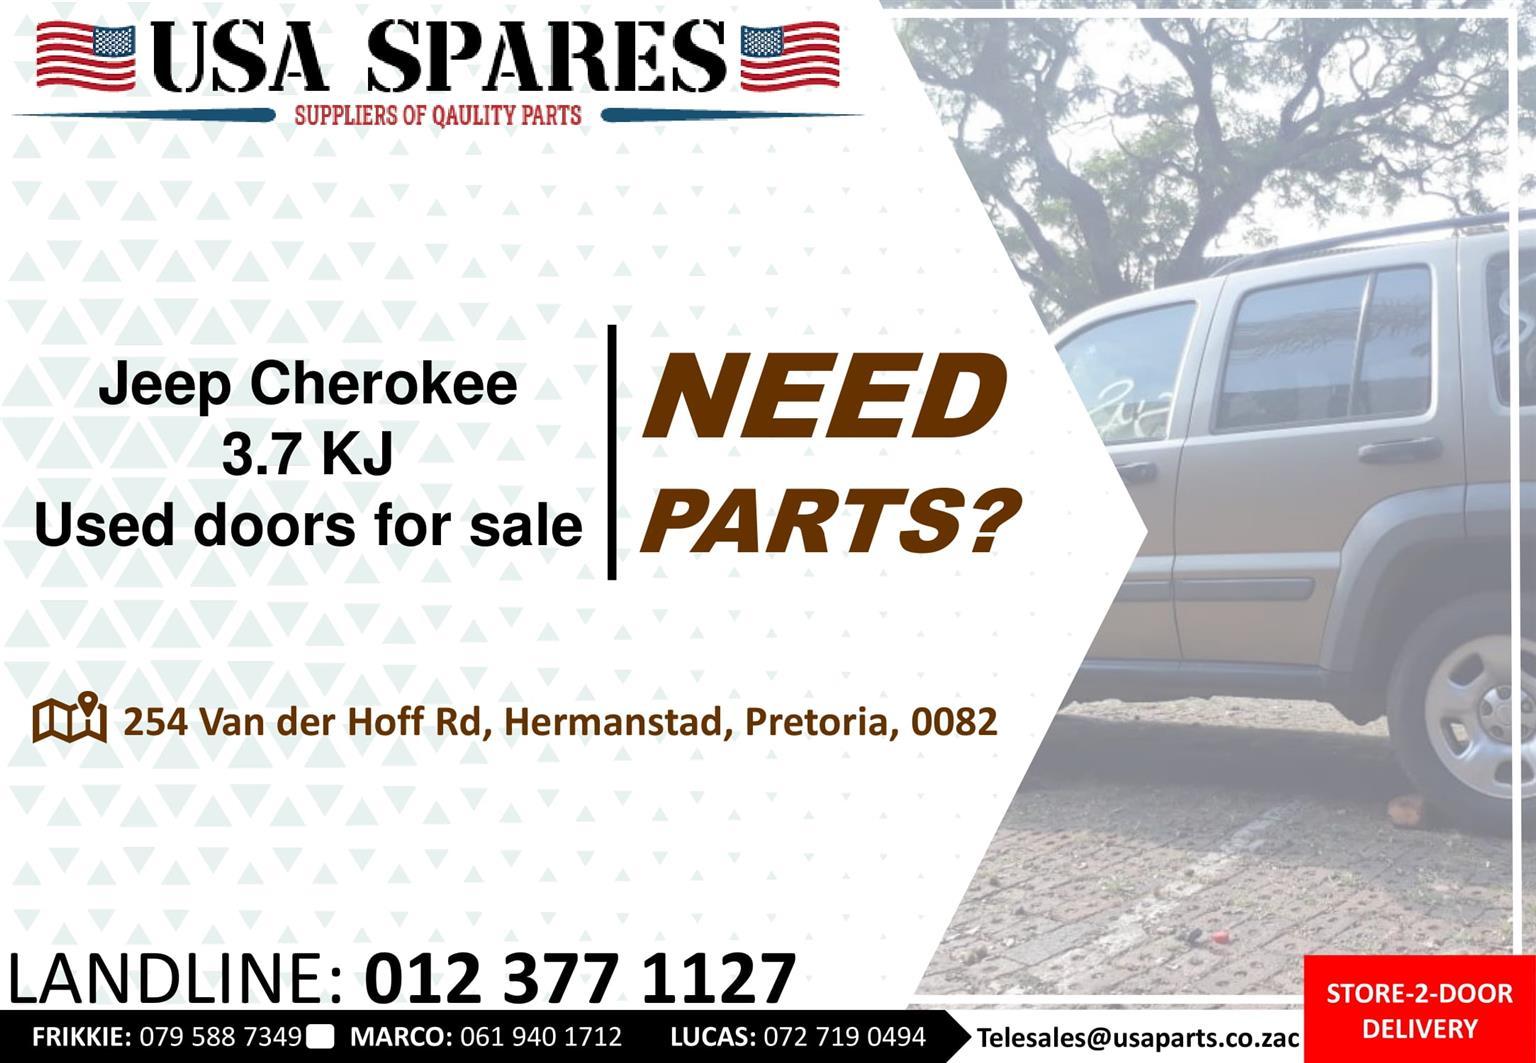 Jeep Cherokee 3.7 KJ 2002-07 used doors for sale